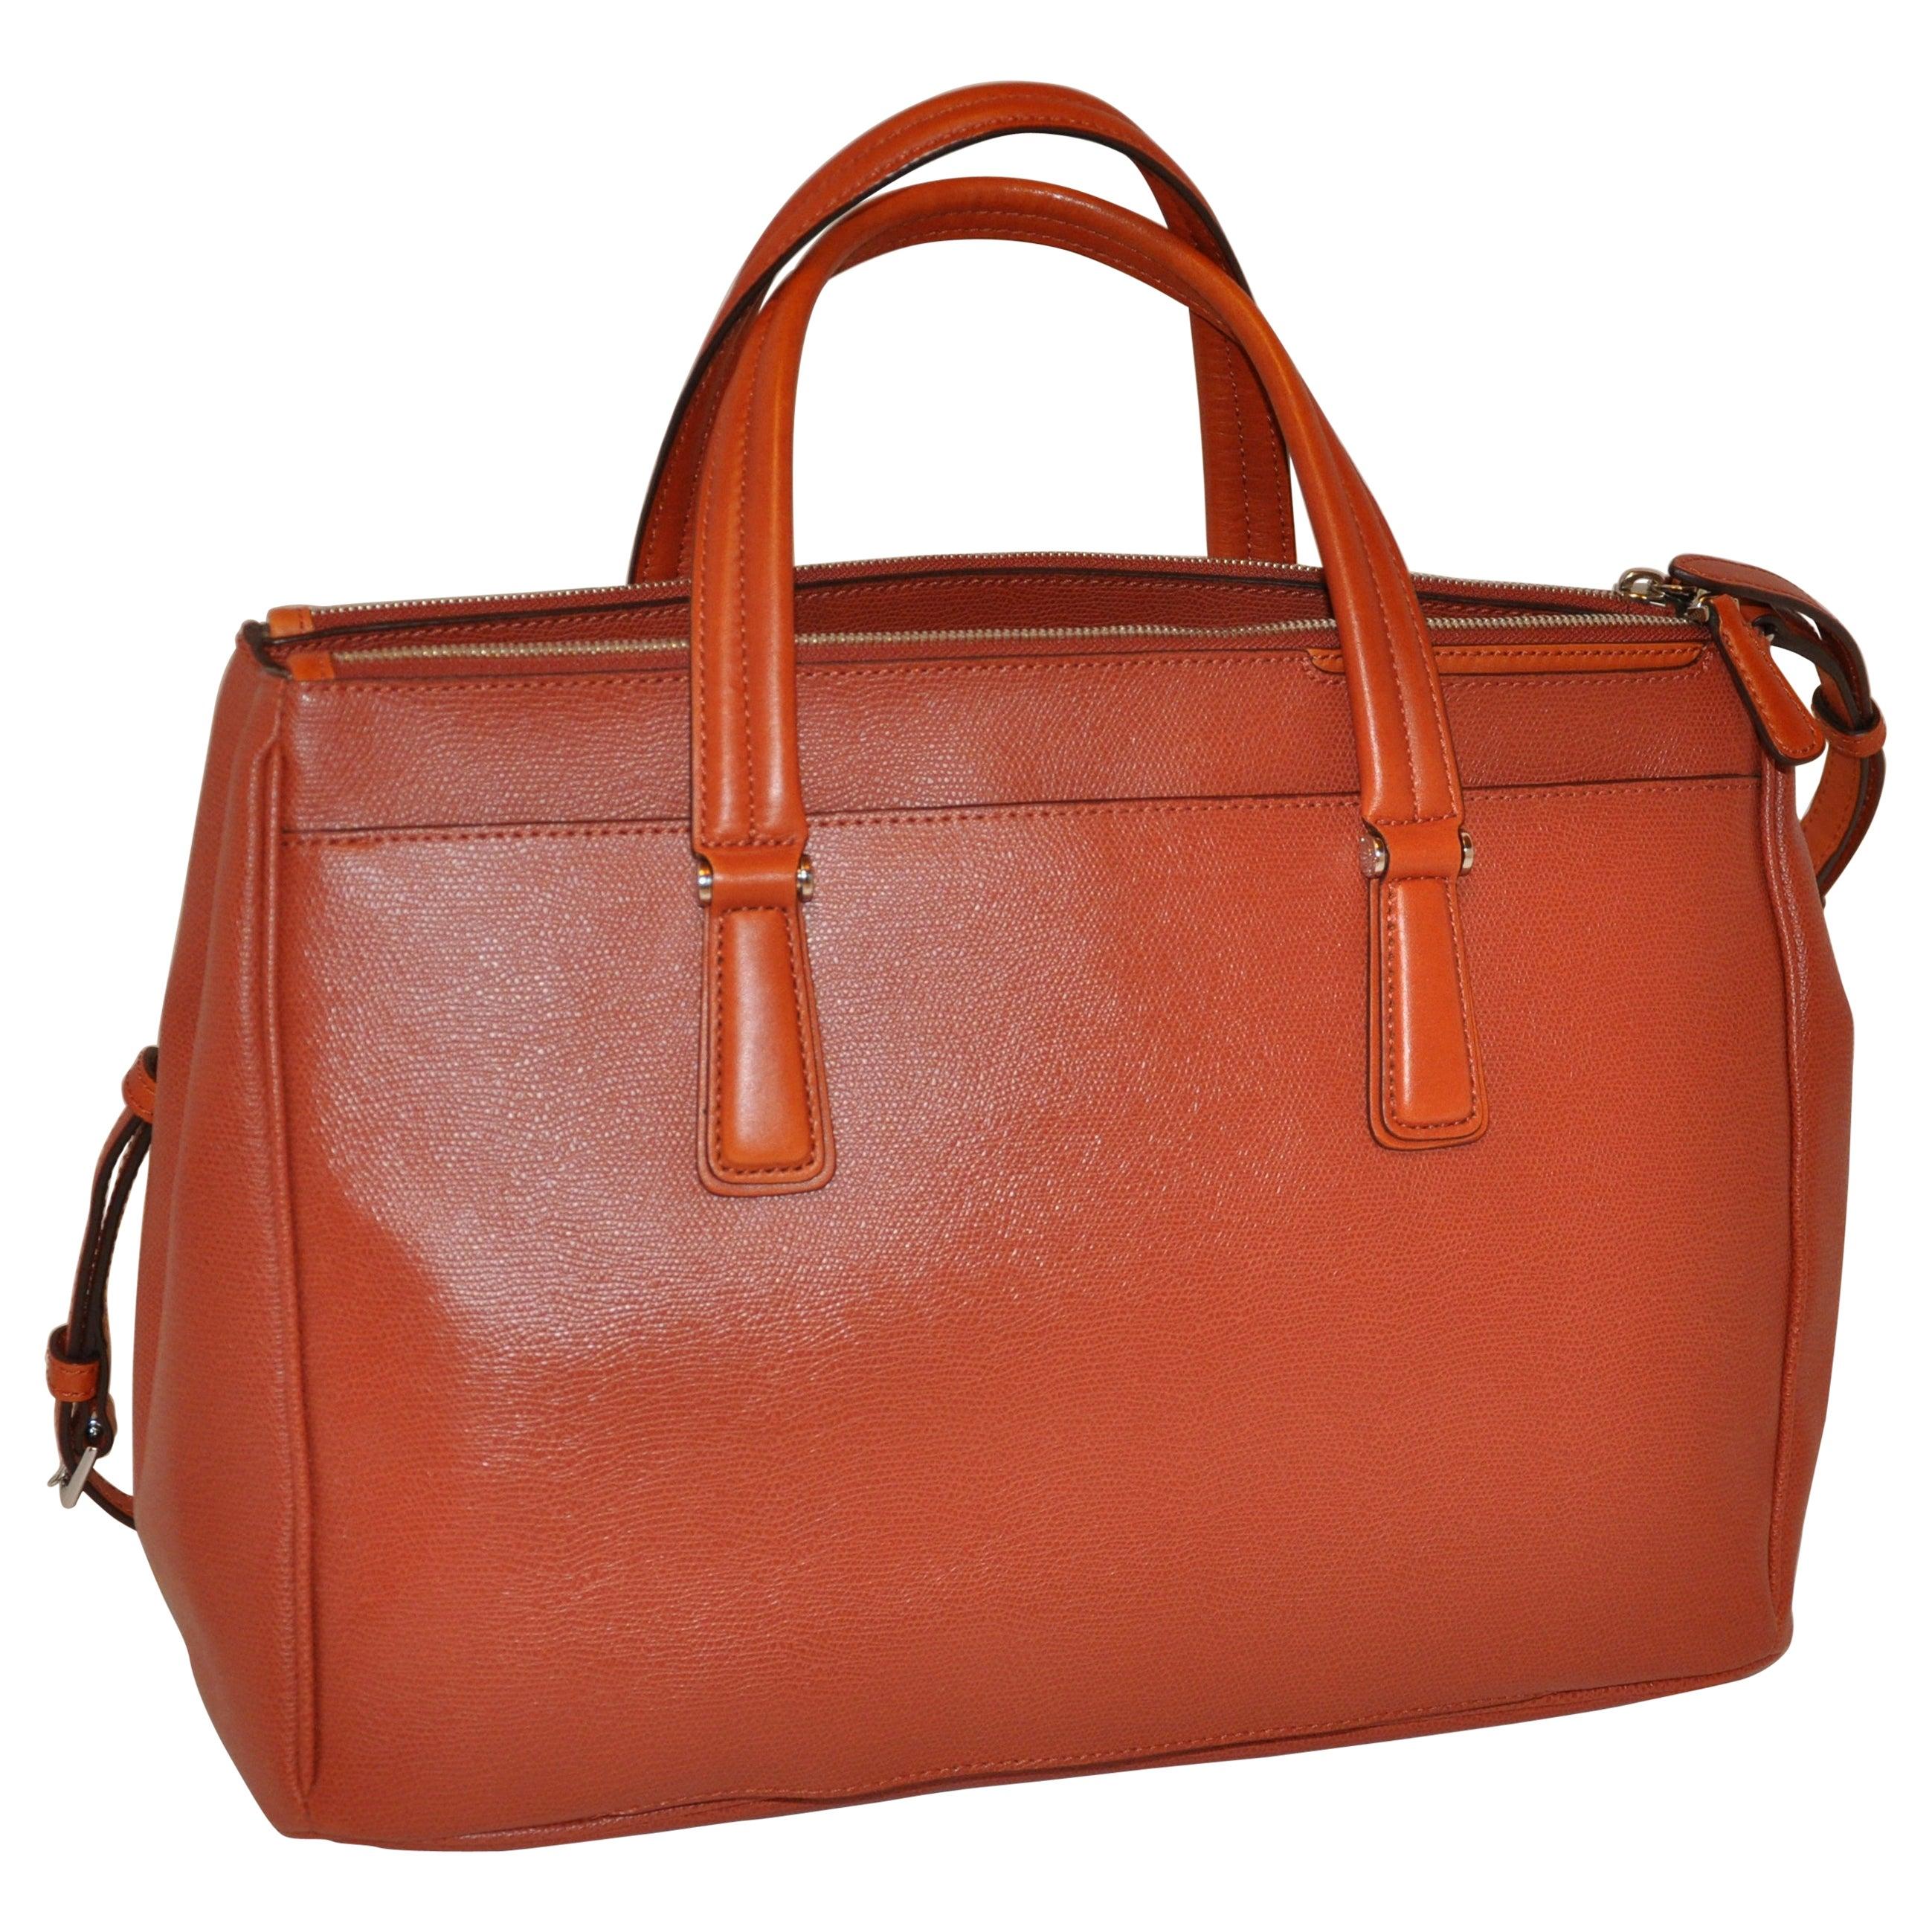 "Tumi ""Limited Edition"" ""Three-Compartment"" Textured Business Travel Handbag"